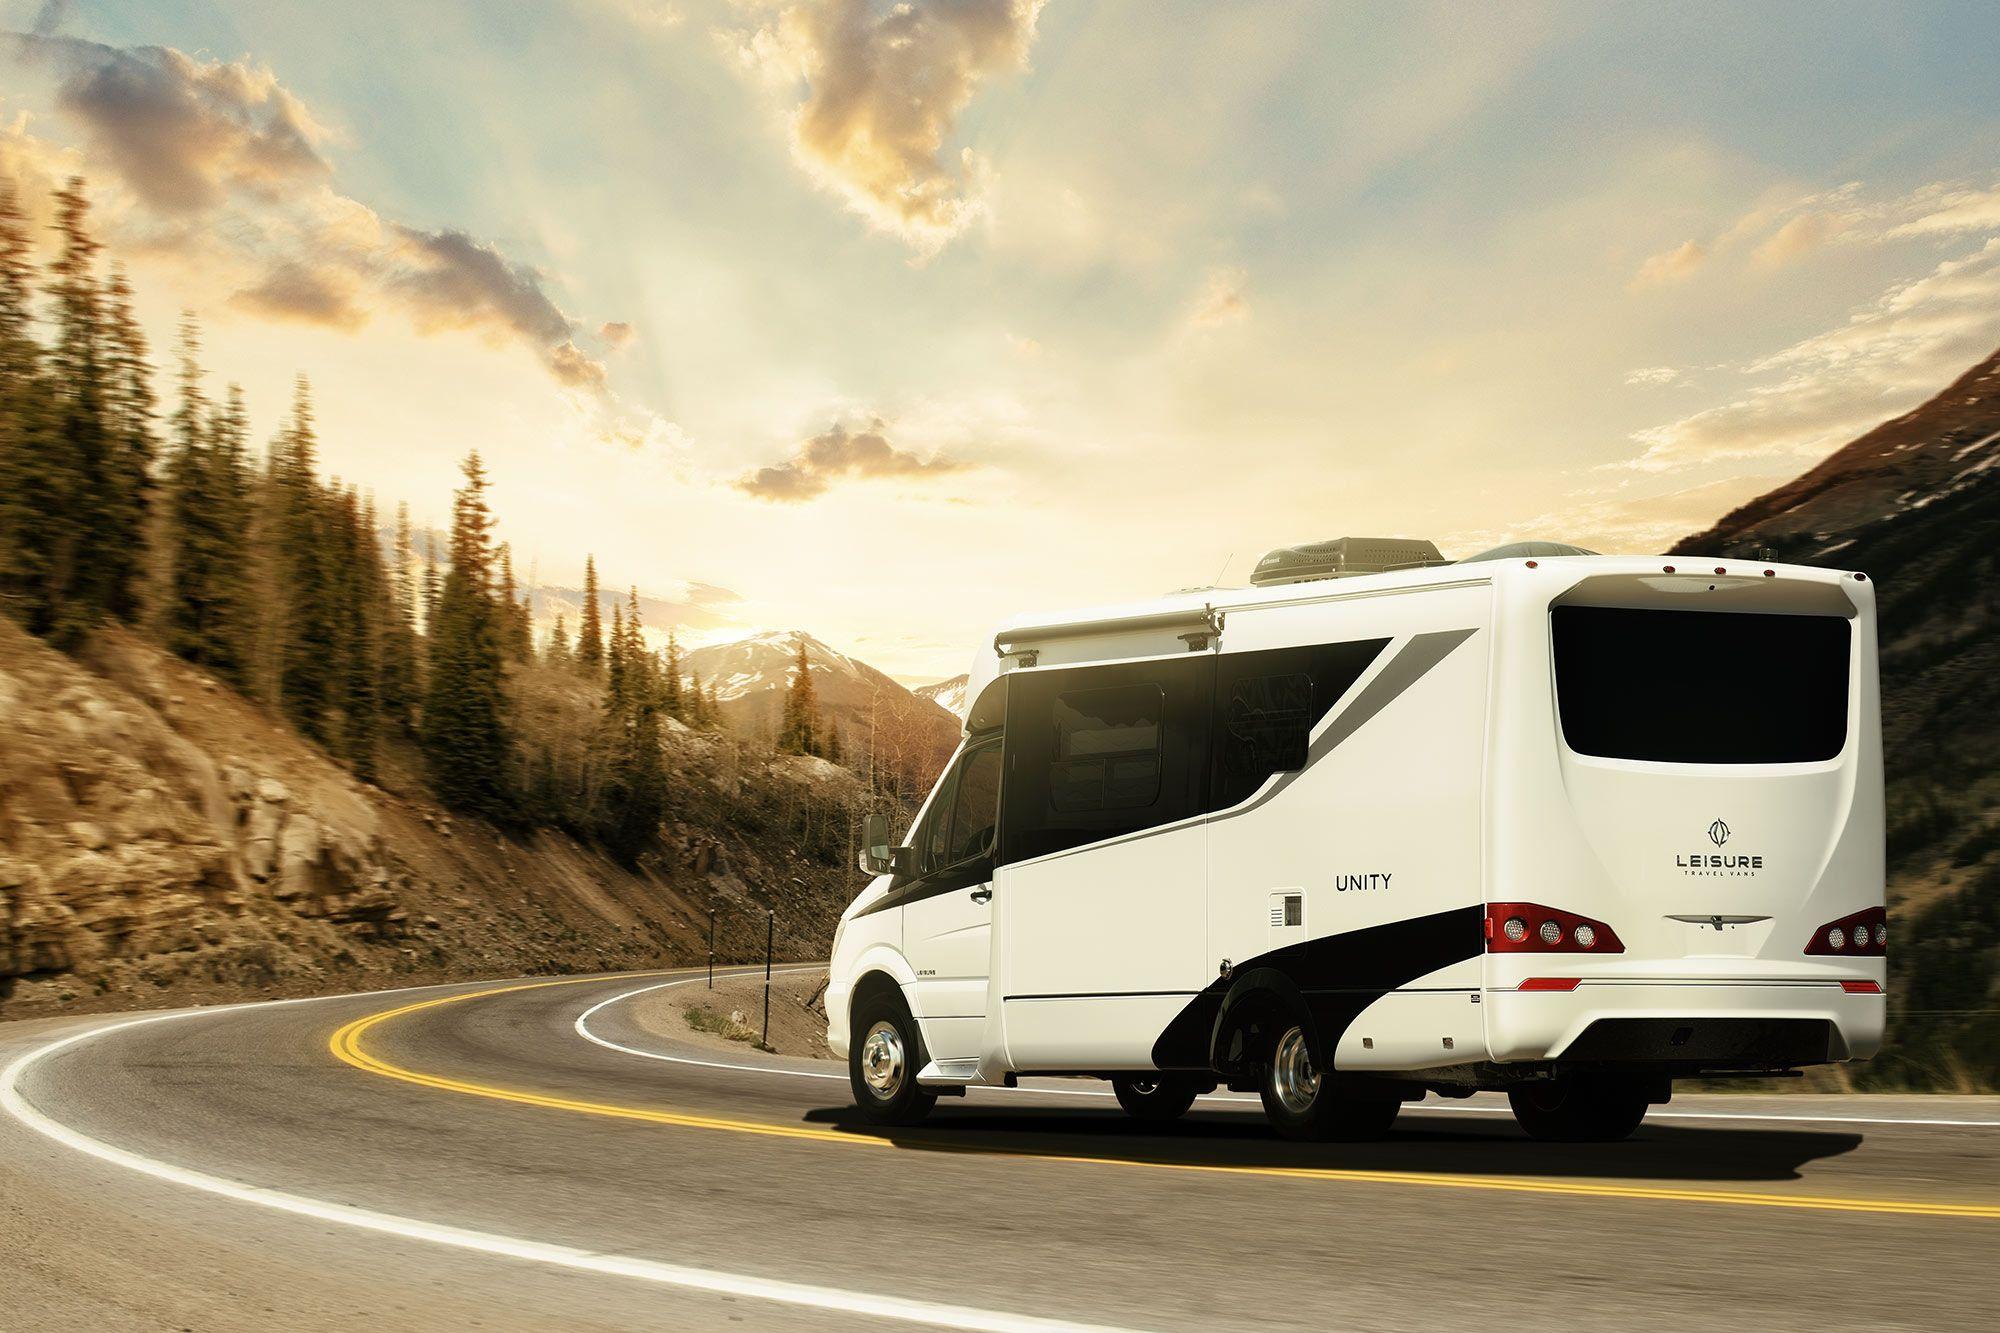 Unity - Camping Dreams Leisure Travel Vans Rv